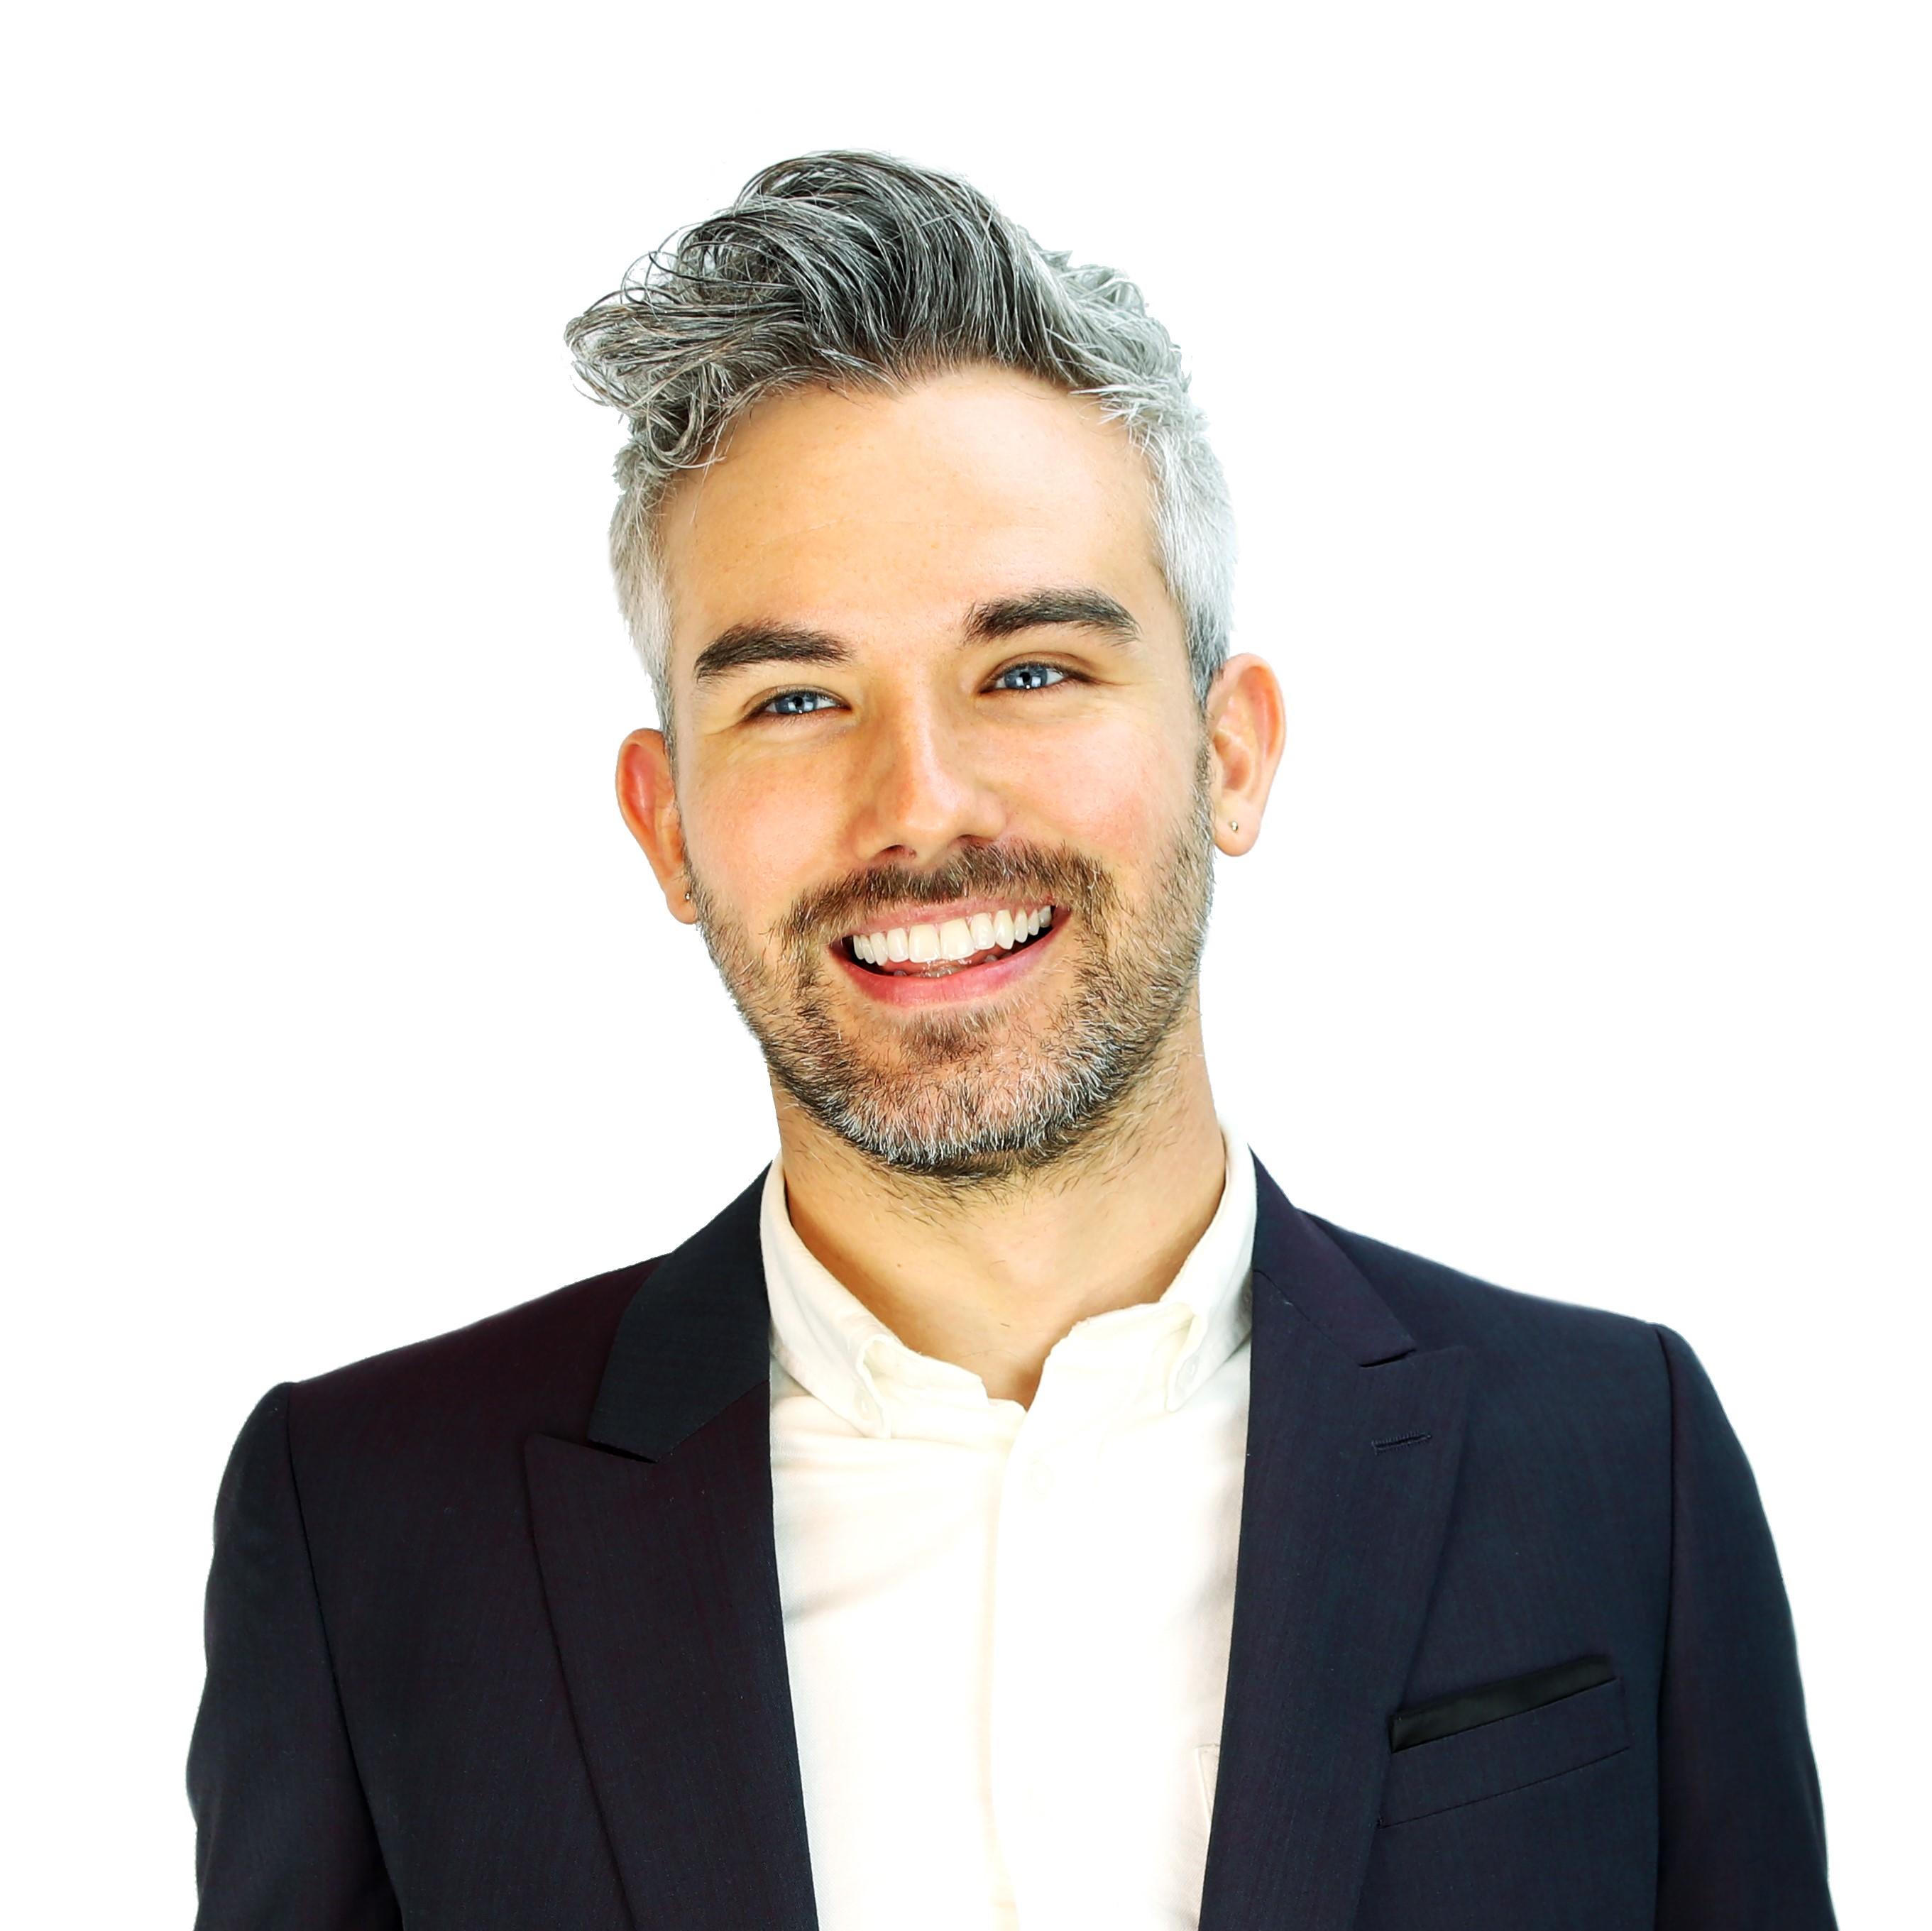 Dr. Dustin Nowaskie